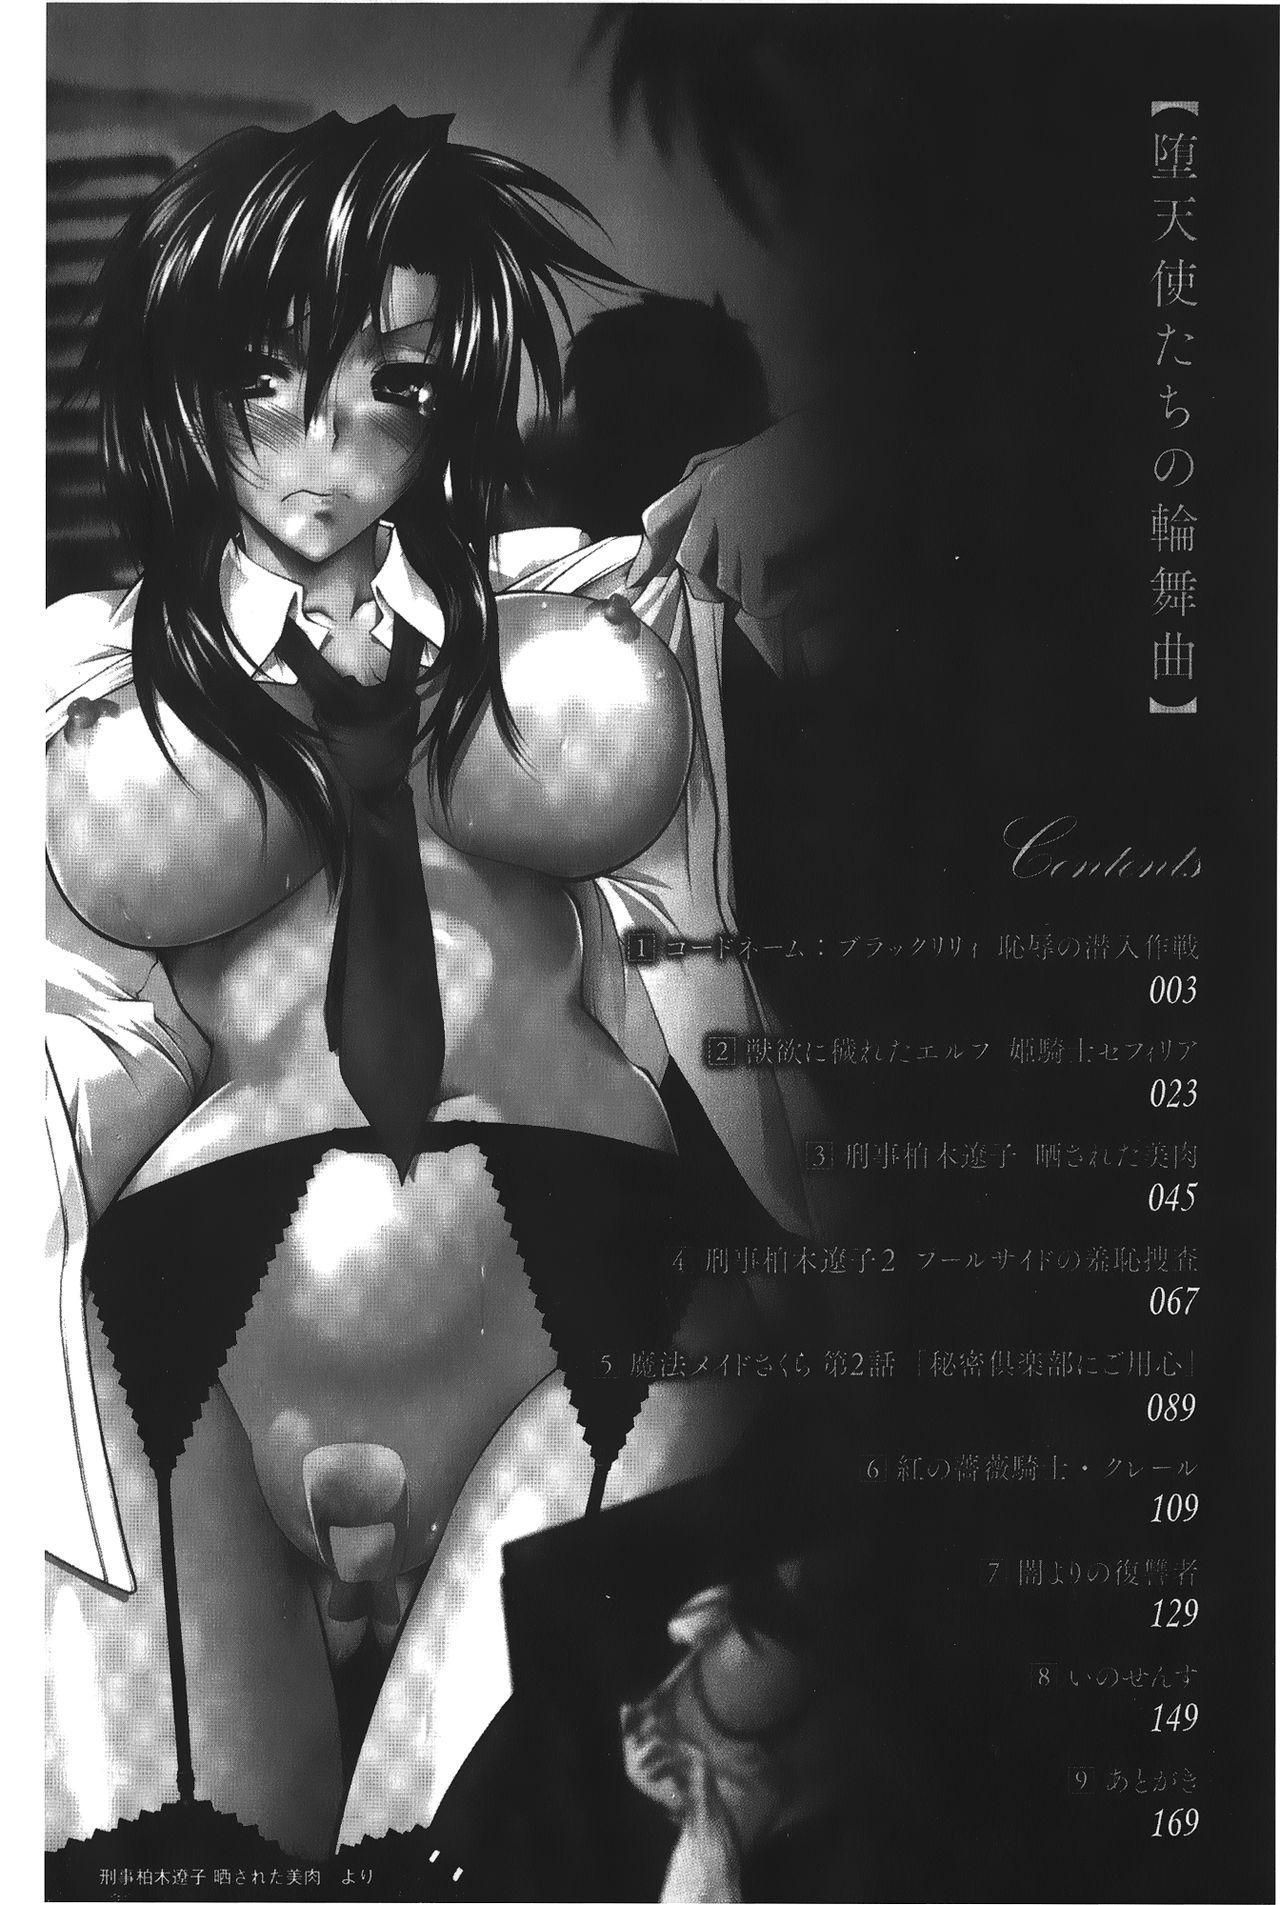 [Parfait] Datenshi-tachi no Rondo - Fallen Angels Rondo   墮天使們的圓舞曲 [Chinese] 2